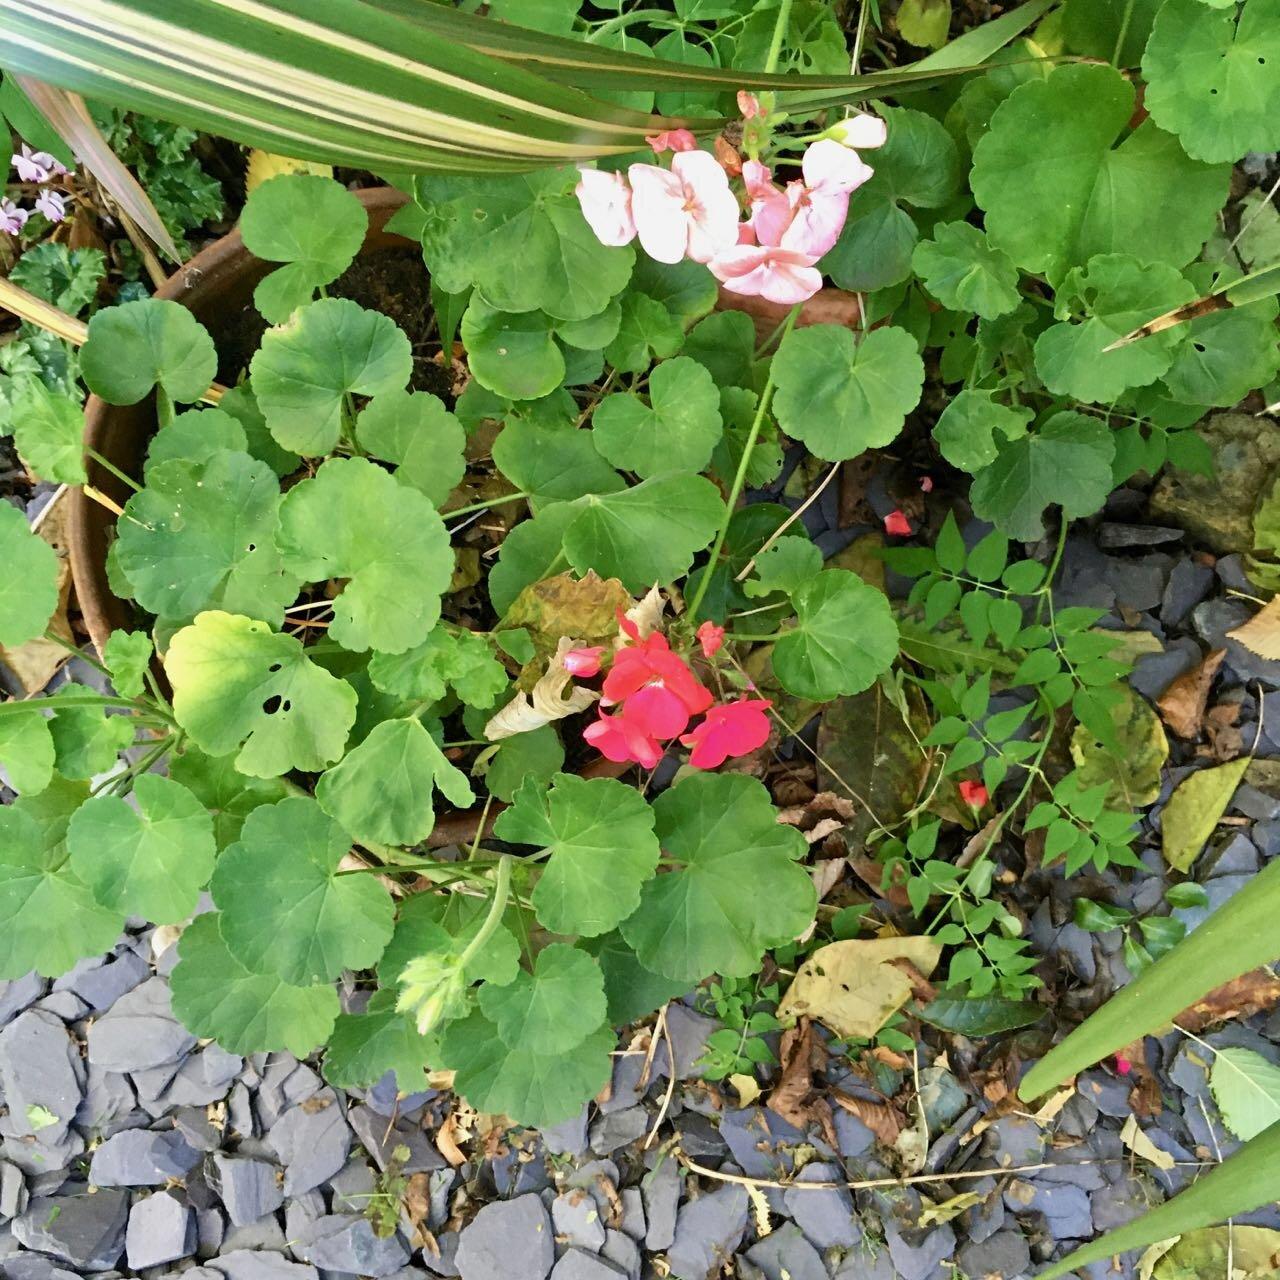 some colourful geraniums